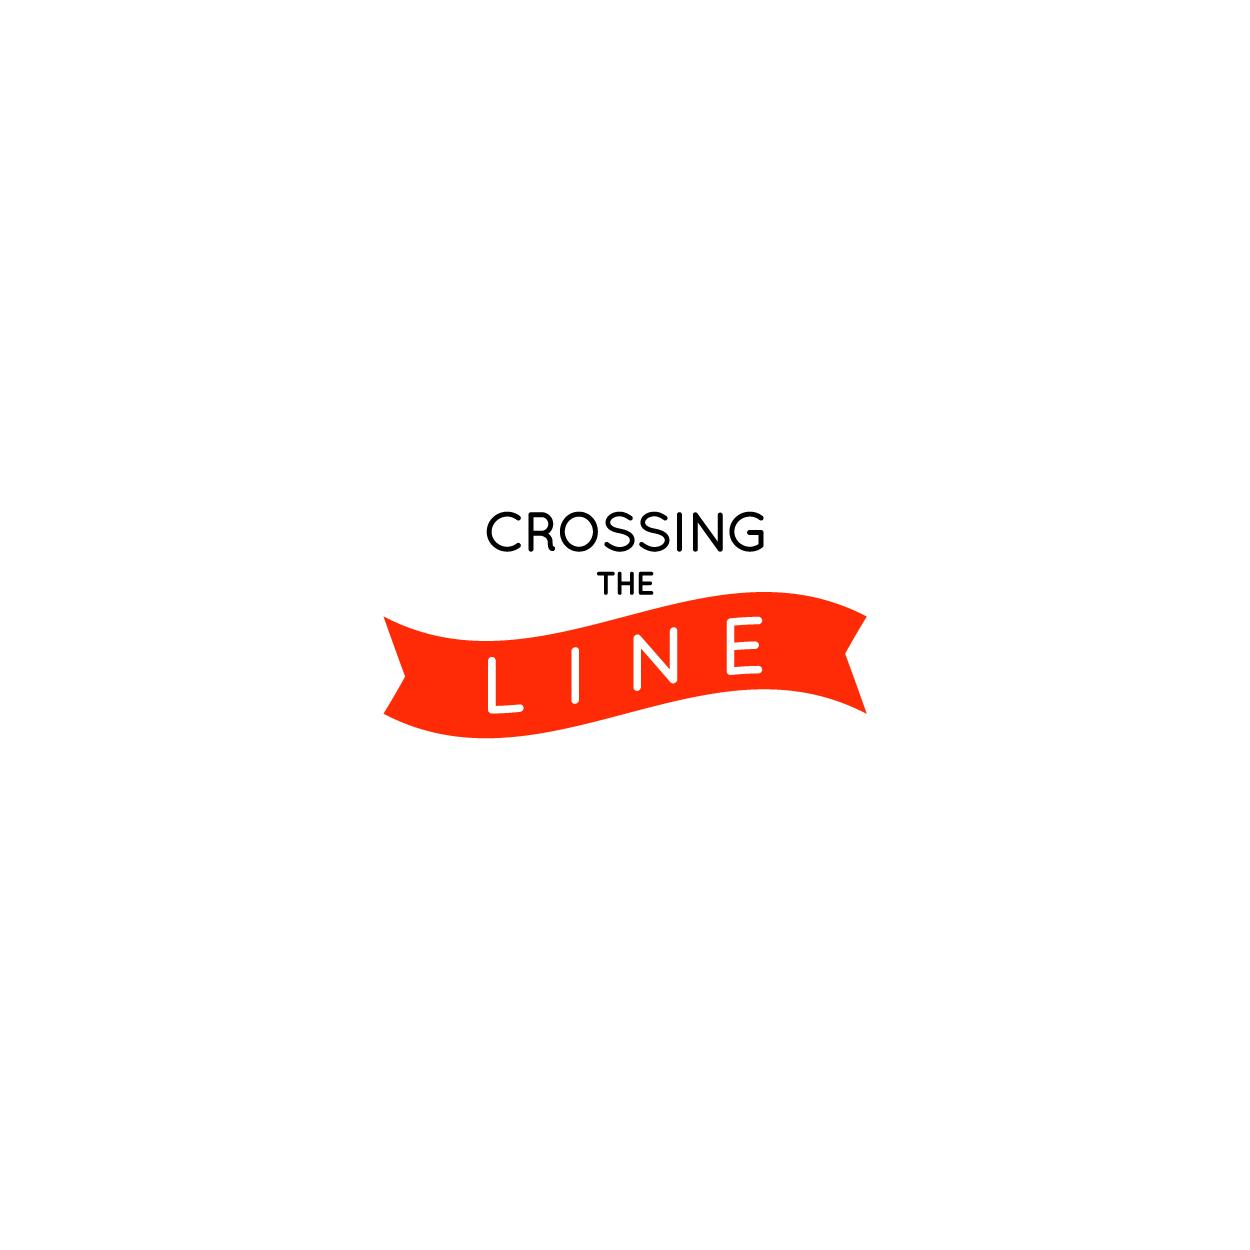 crossing-the-line-logo